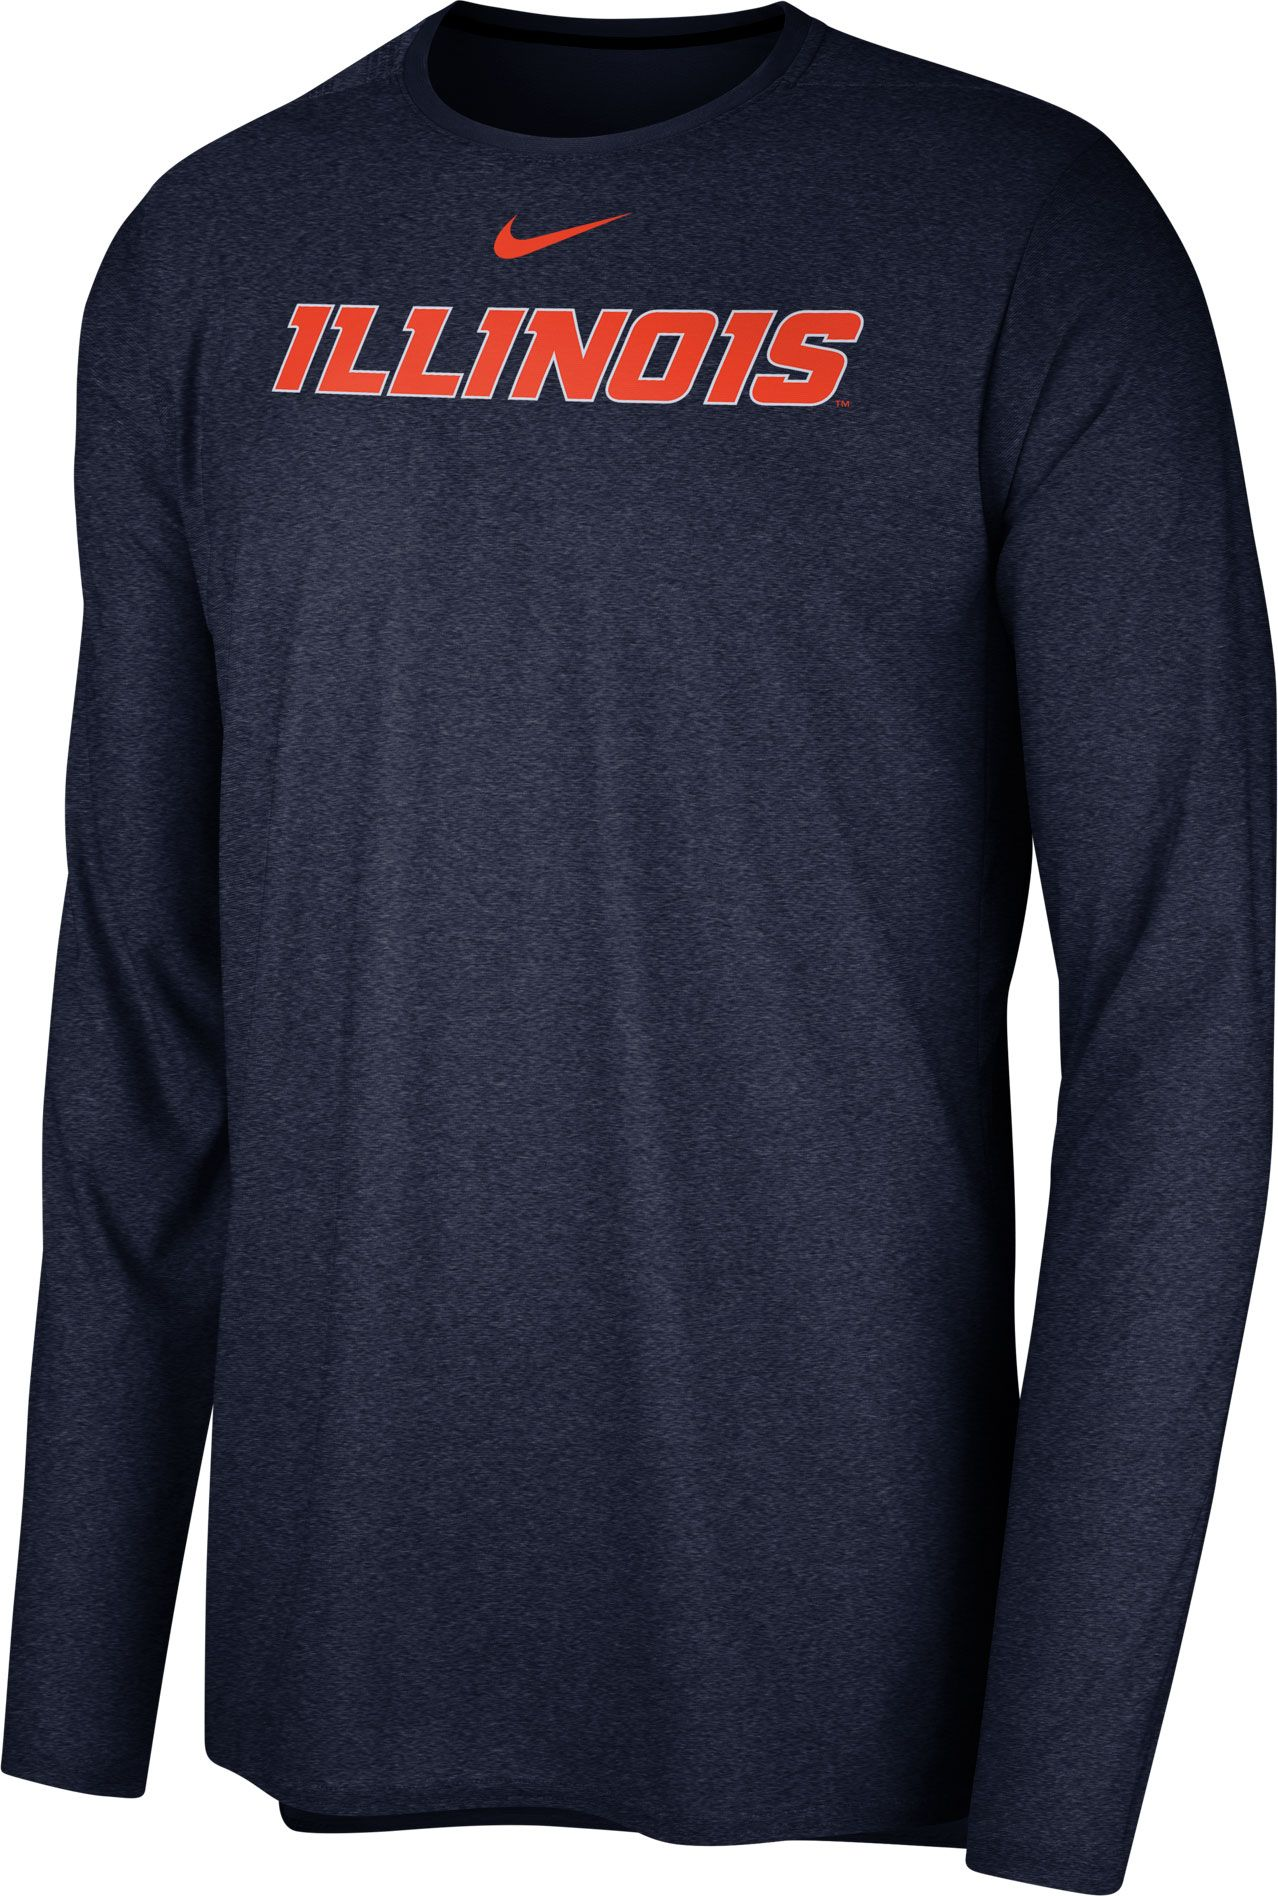 b3b5a152718a Nike Men s Illinois Fighting Illini Blue Football Dri-FIT Player Long  Sleeve T-Shirt